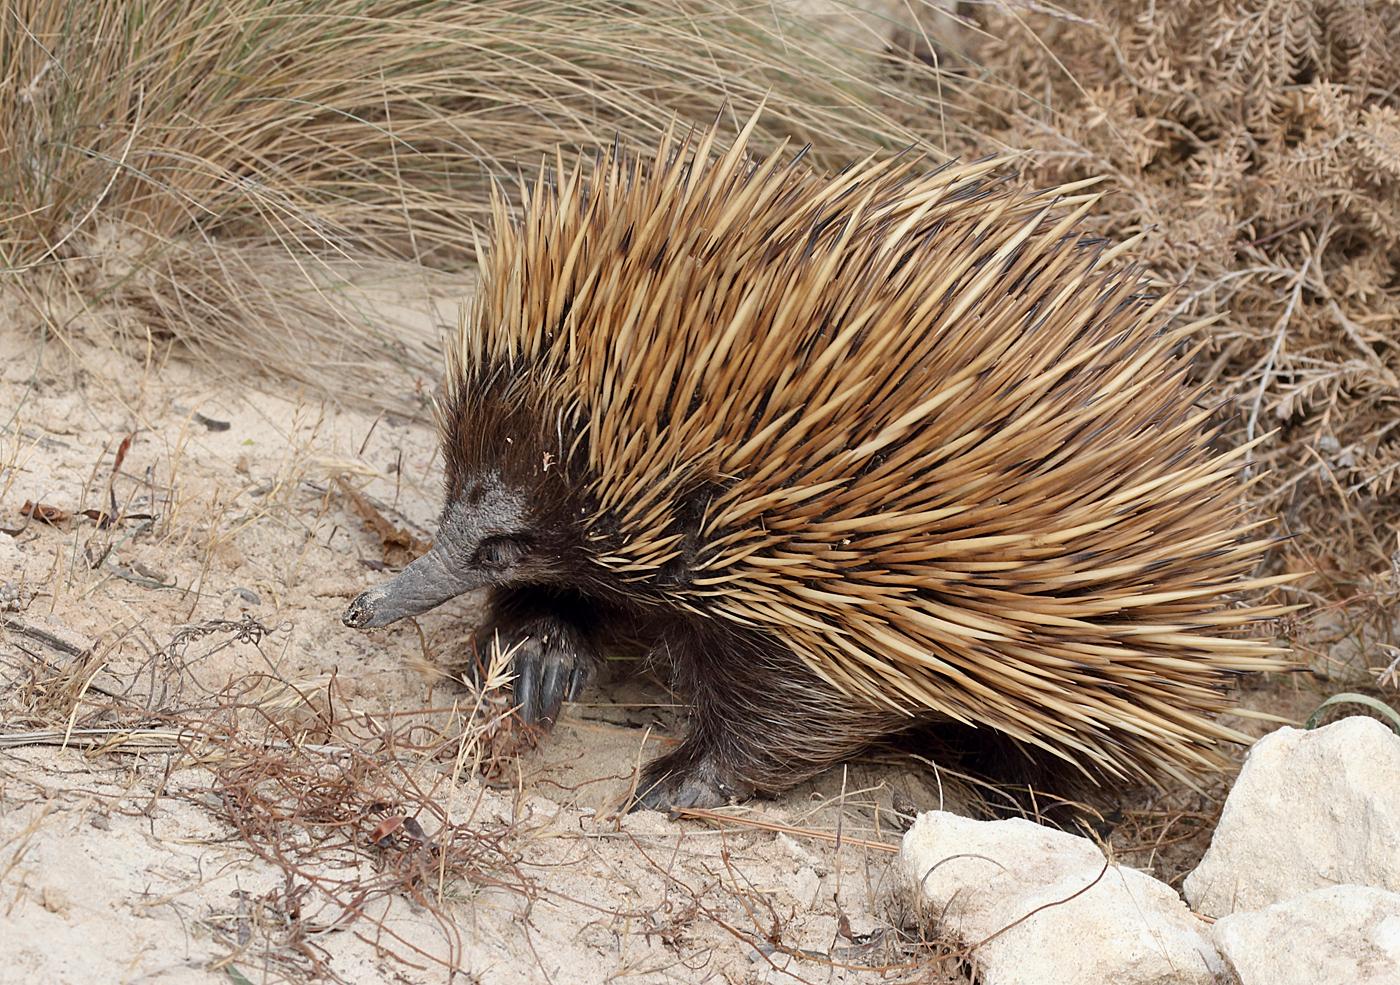 Echidna, Platypus and Mammals on Pinterest